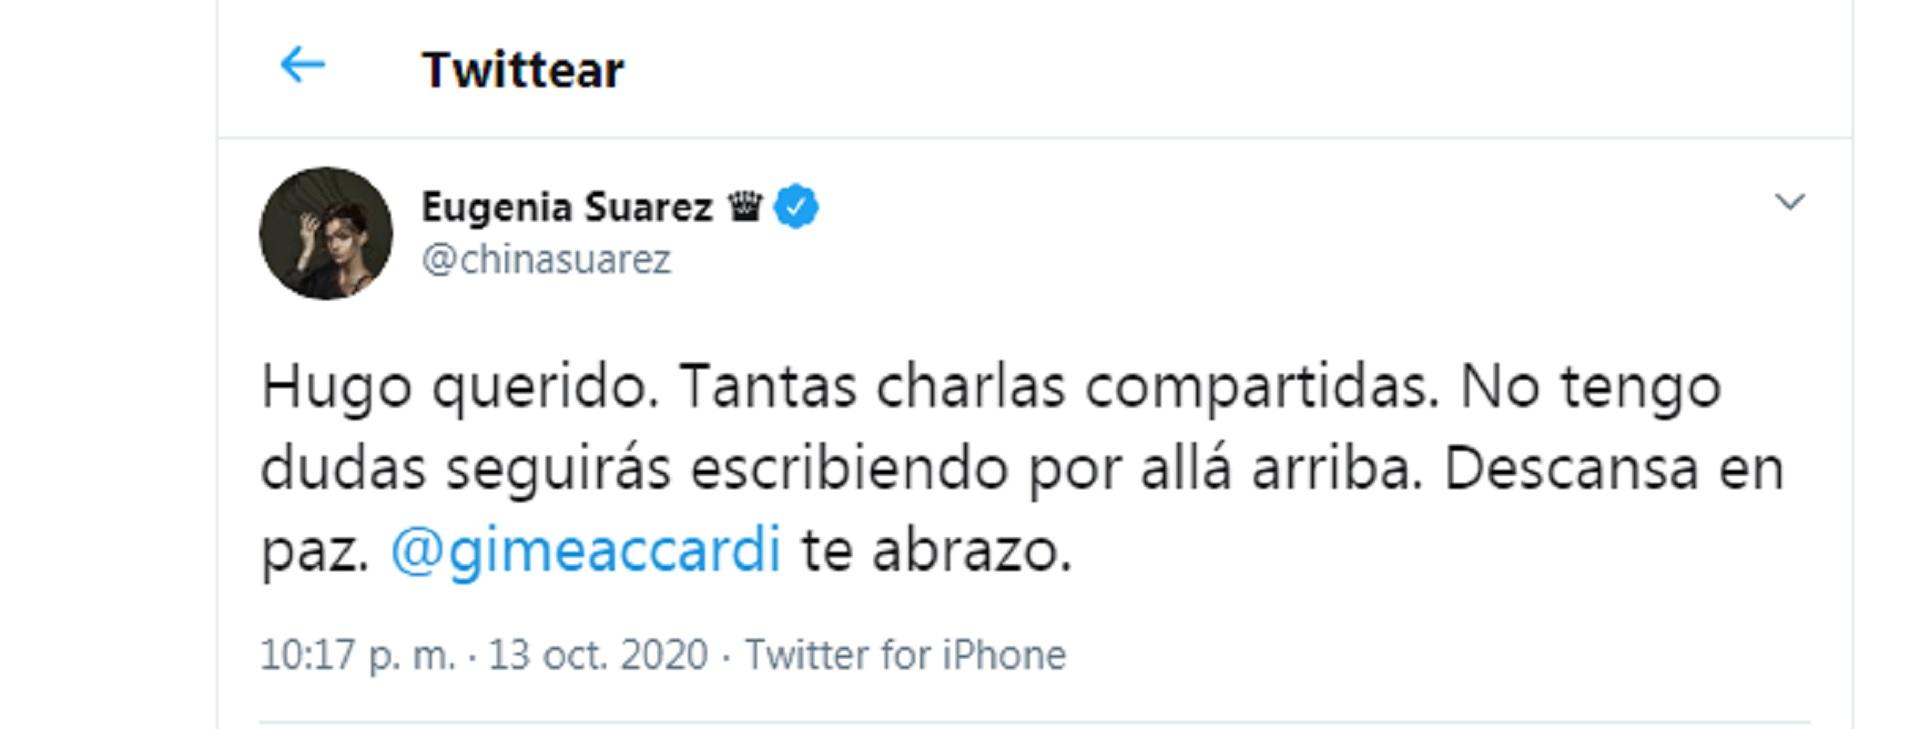 El mensaje de la China Suárez a Gime Accardi por la muerte de su padre